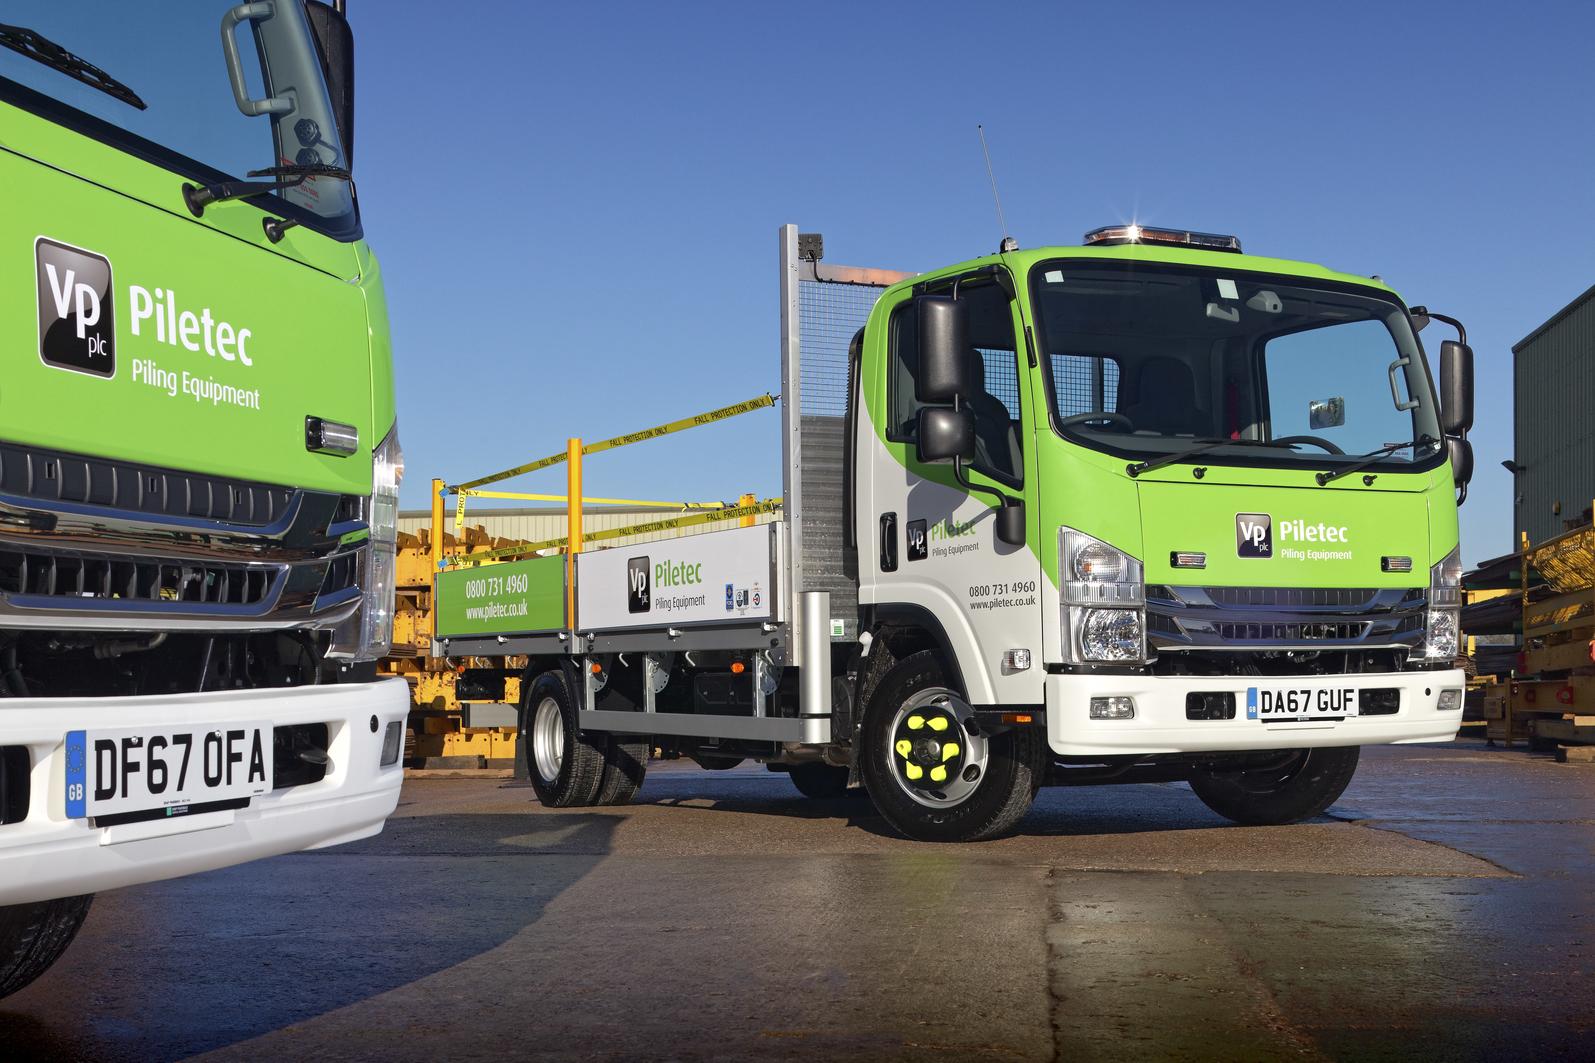 7.5 tonne Isuzu Beavertail Trucks for Piletech